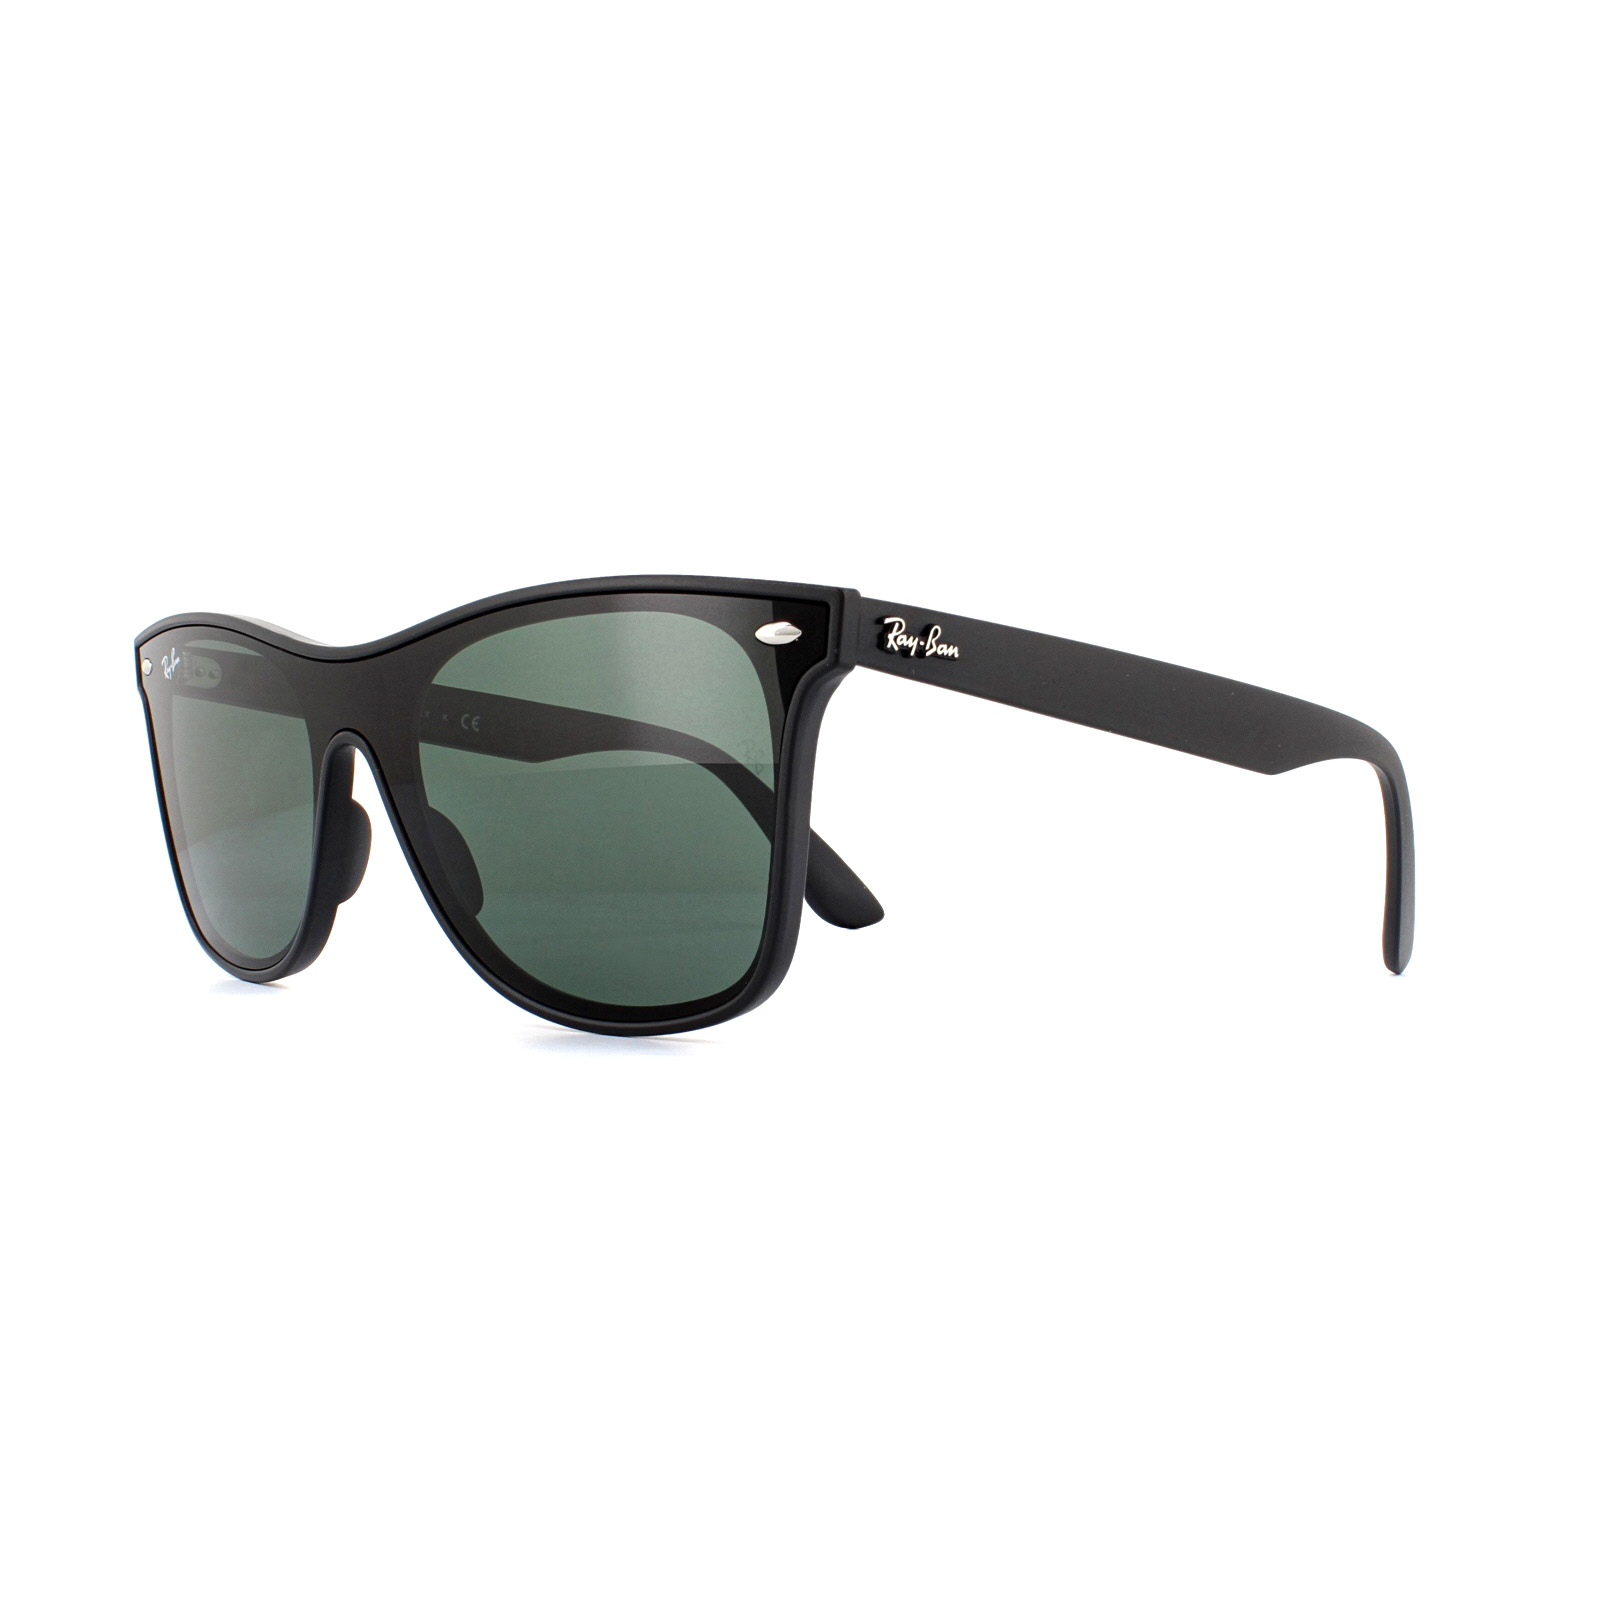 869be4e00d Cheap Ray-Ban Blaze Wayfarer 4440N Sunglasses - Discounted Sunglasses